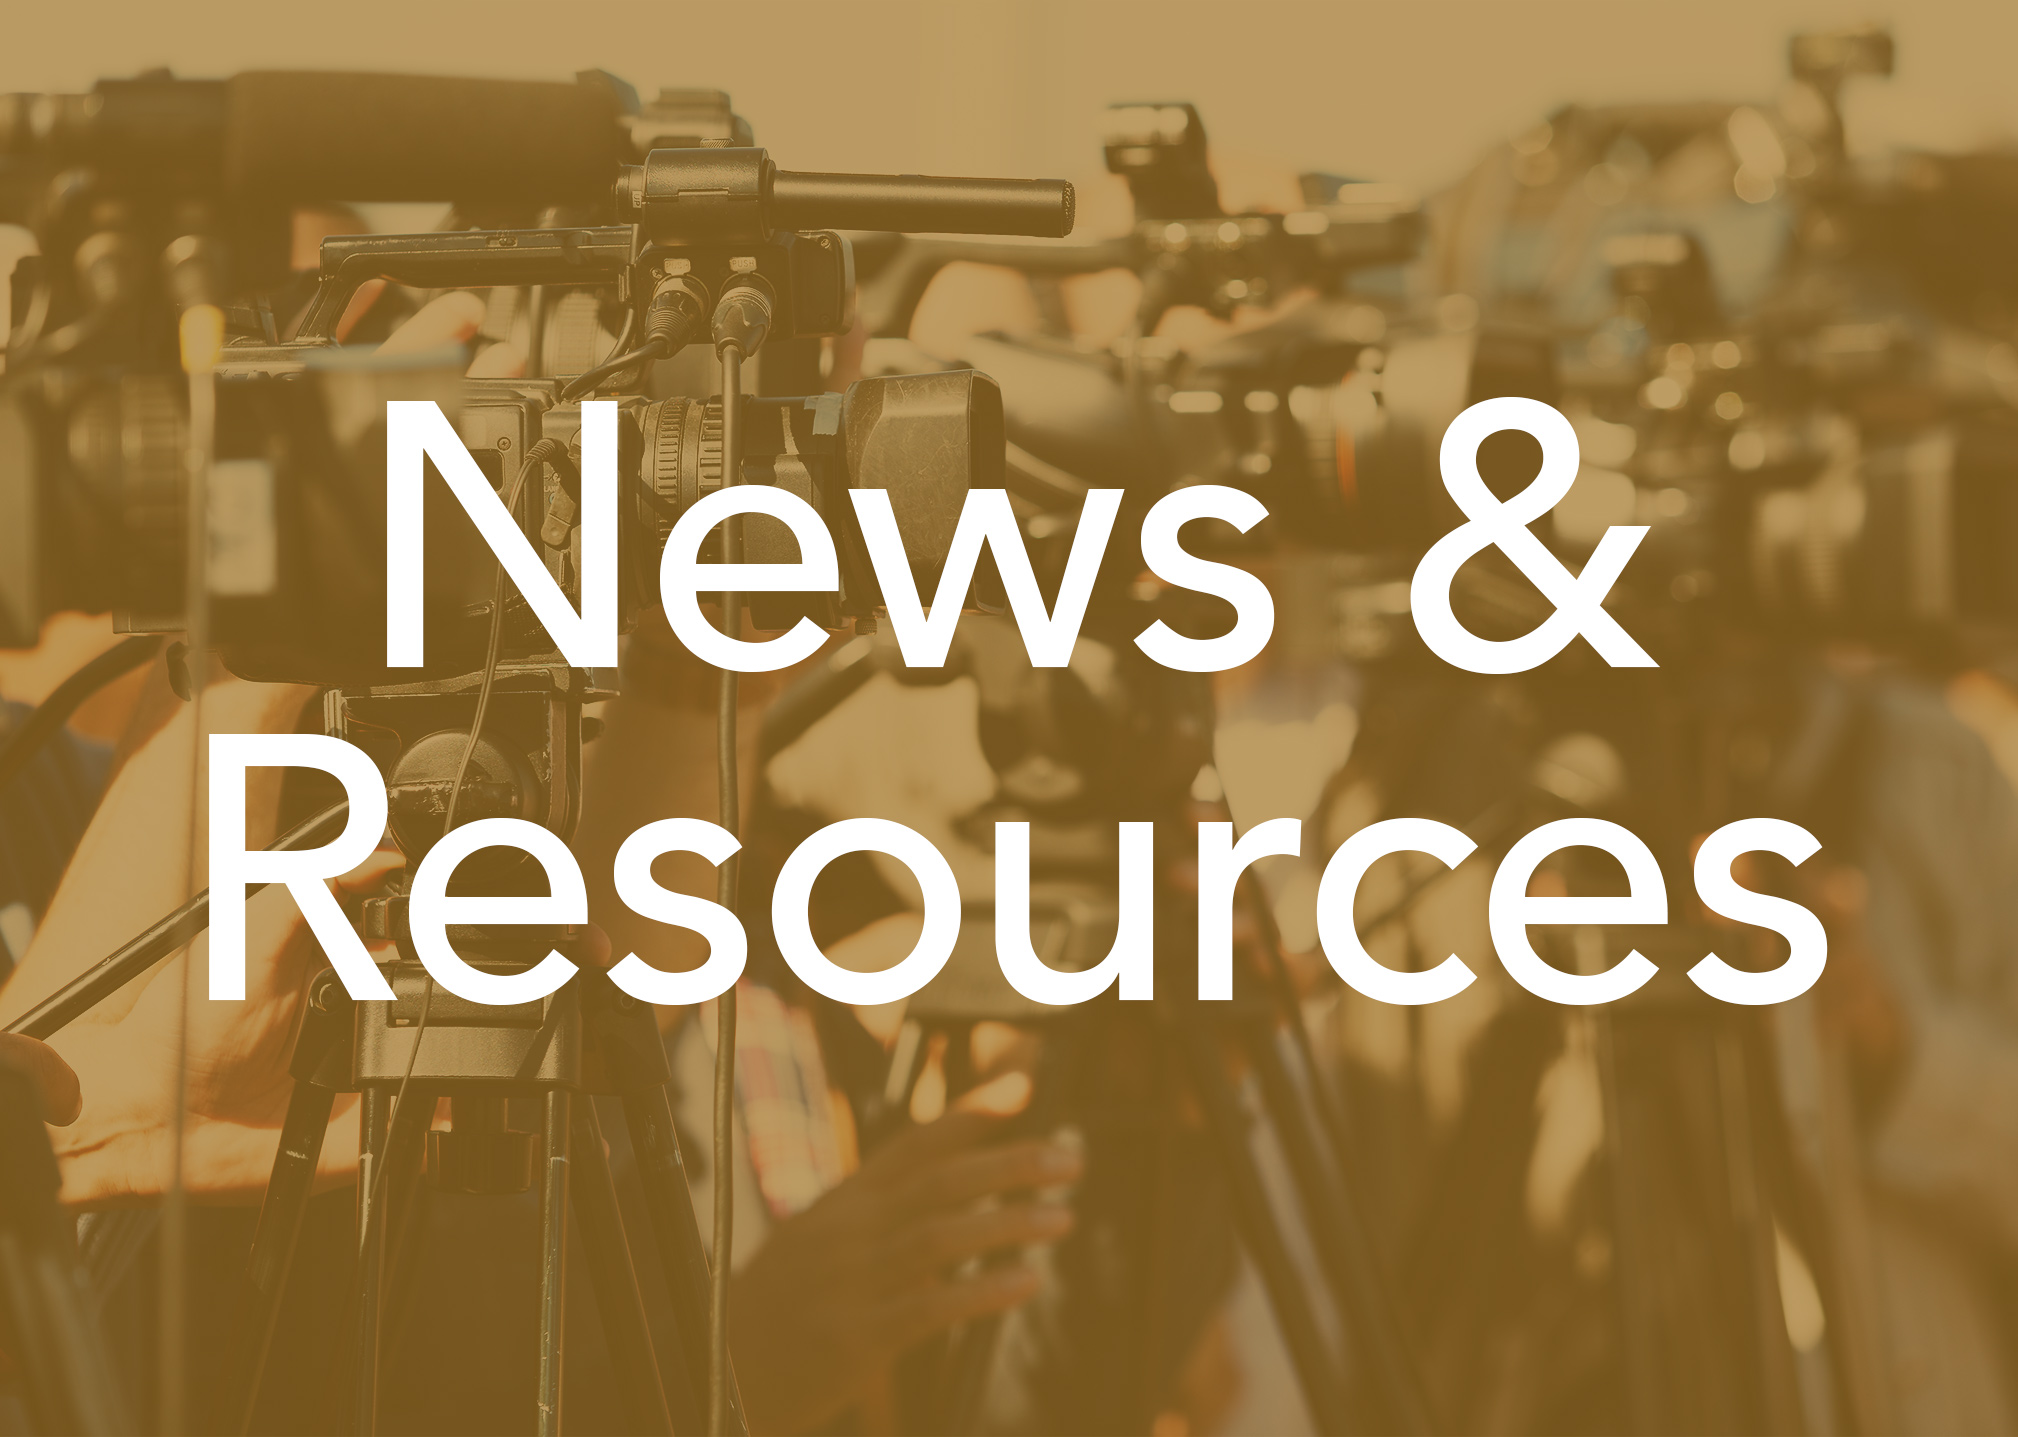 News & Resources